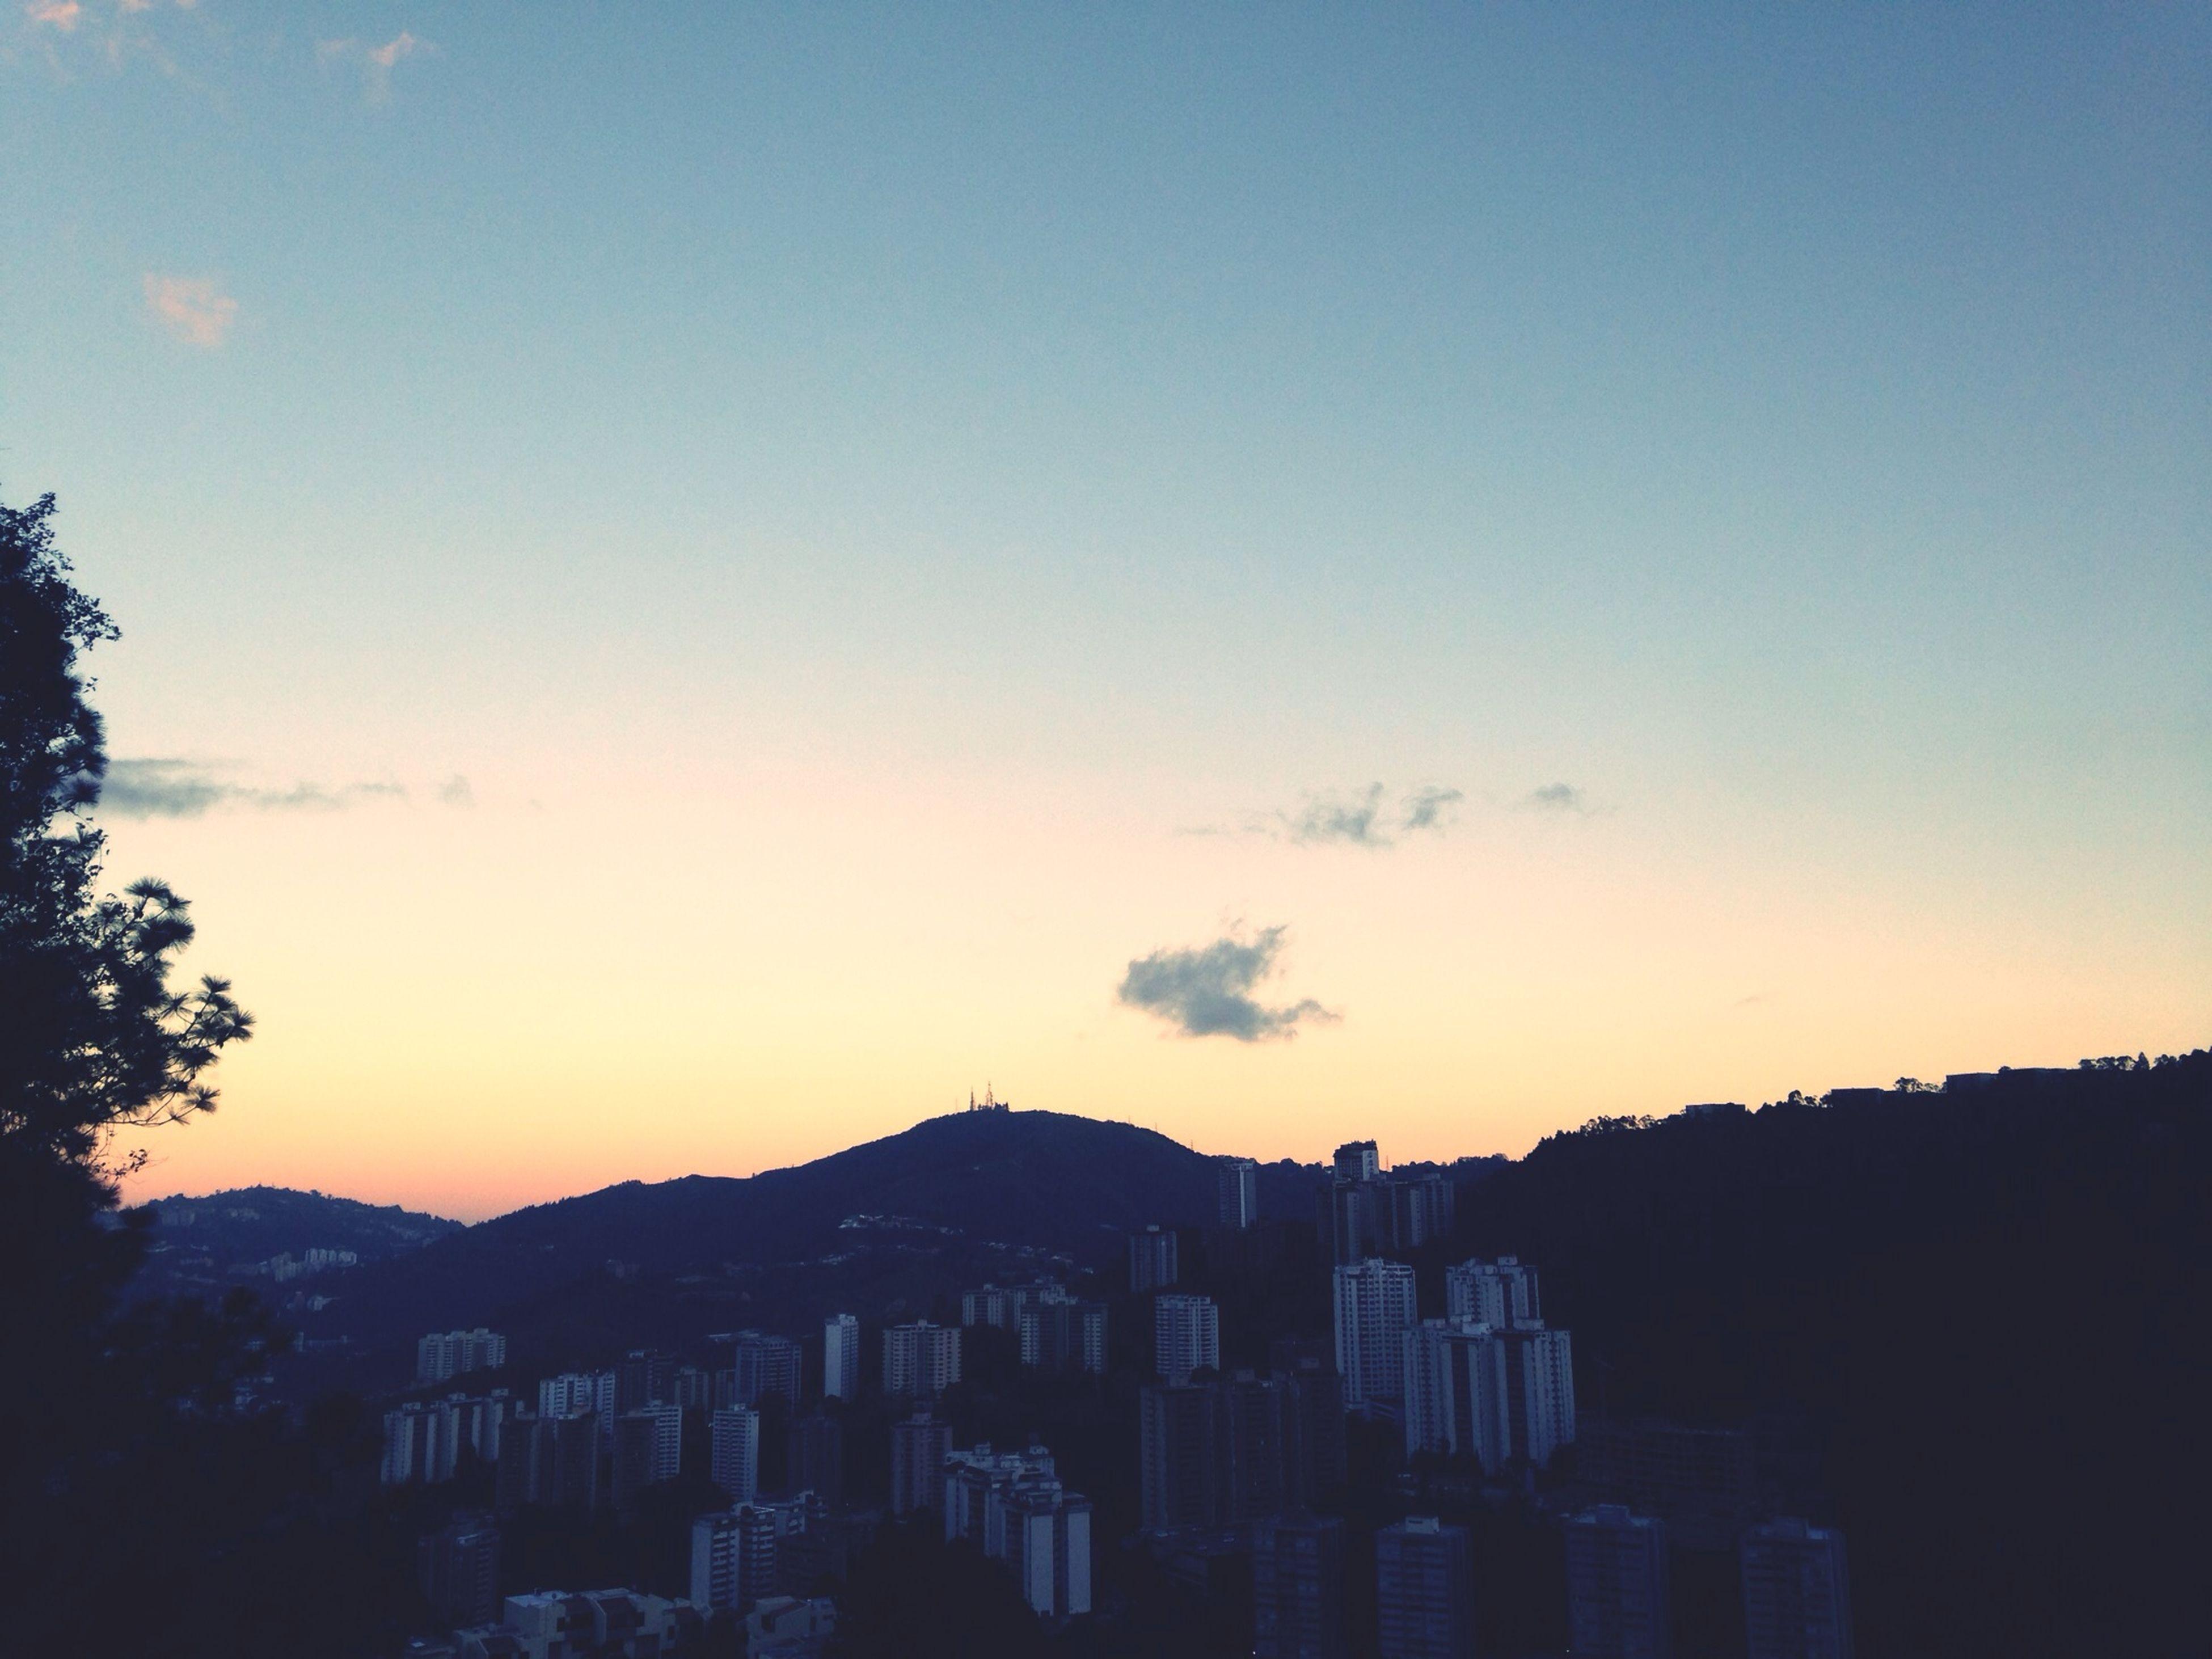 building exterior, architecture, built structure, sunset, city, cityscape, copy space, sky, silhouette, residential structure, residential building, clear sky, orange color, residential district, building, no people, outdoors, dusk, blue, mountain